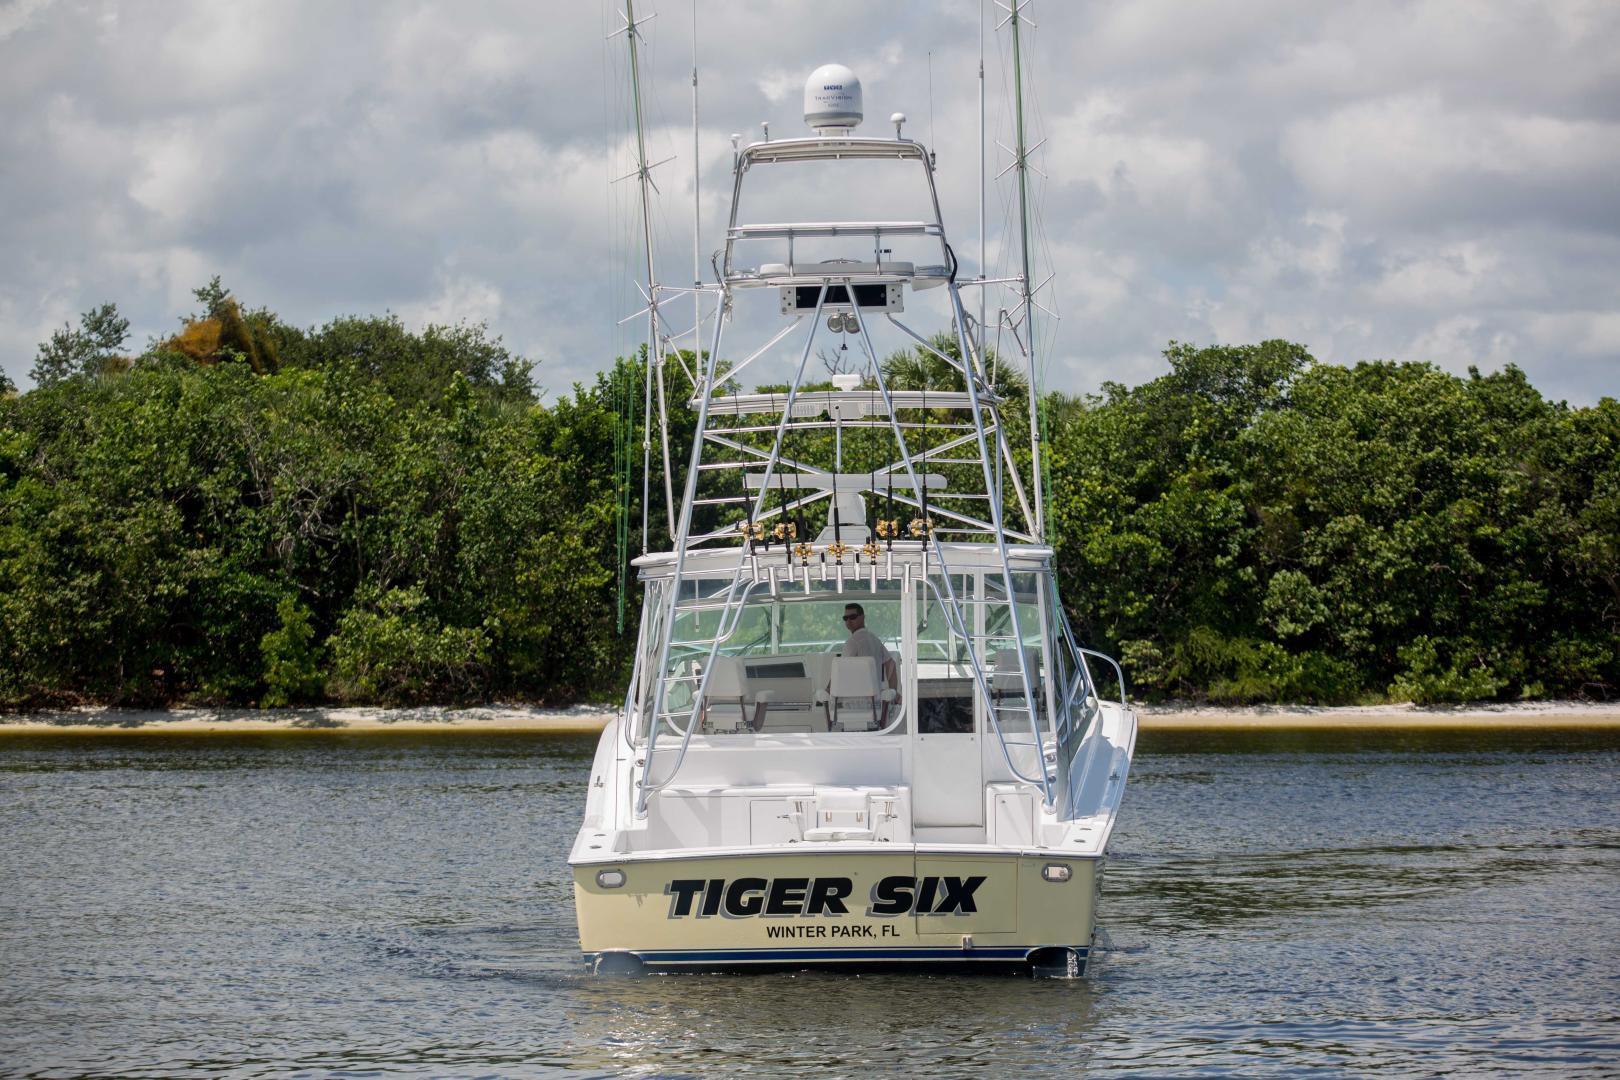 Viking 50 - Tiger Six - Exterior Profile